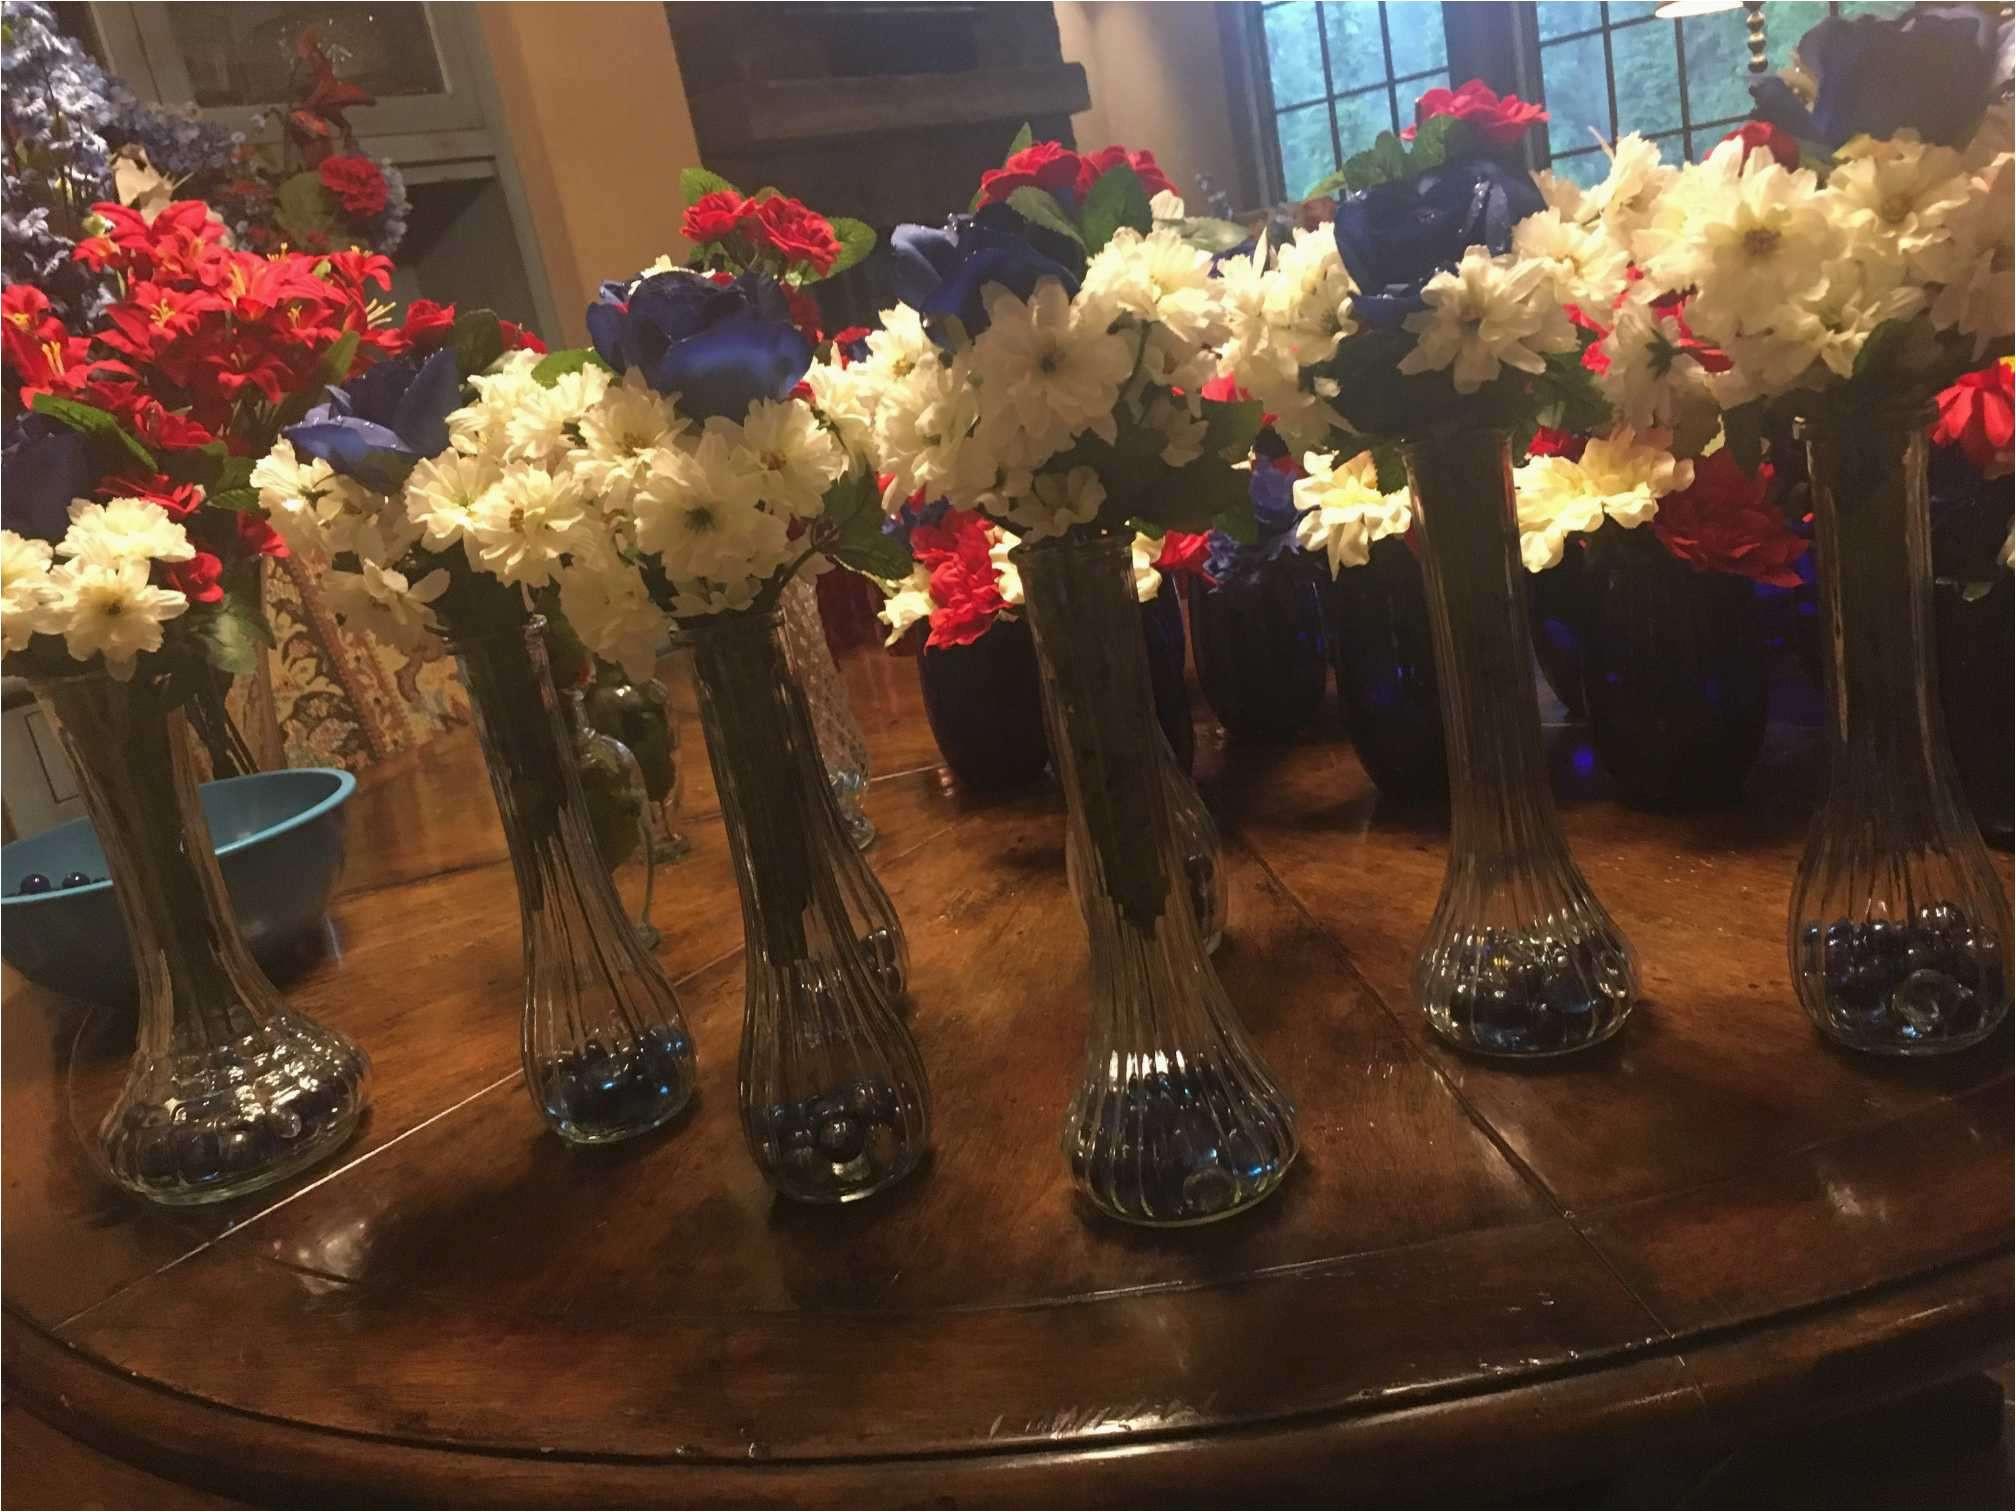 dark blue vase of places to register for wedding new living room vases wedding with vase i 0d with a· best places to register for wedding format